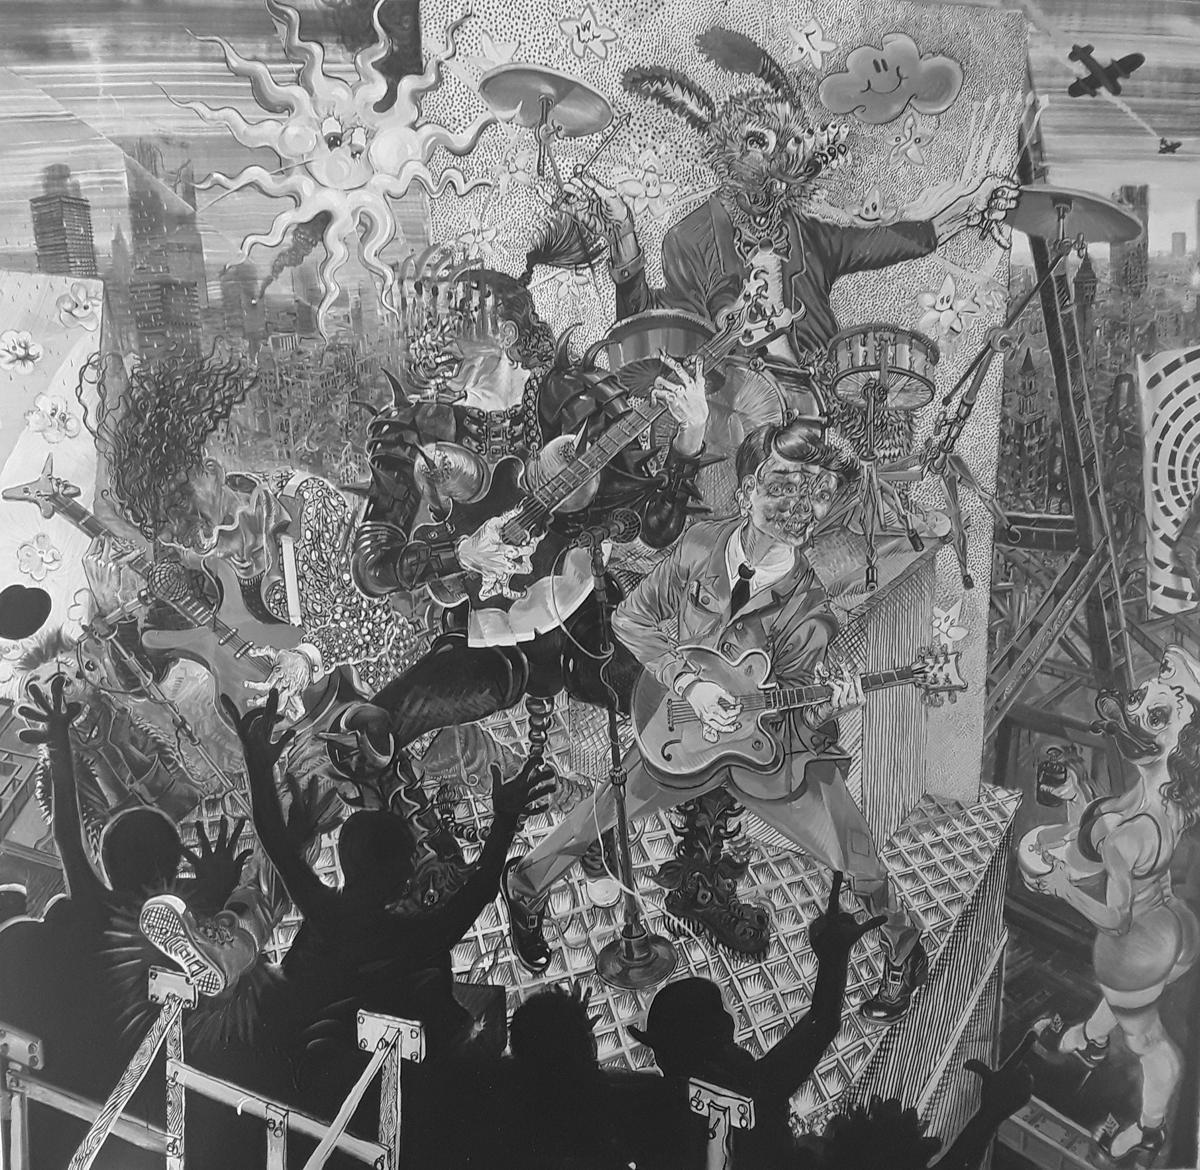 Painting - La musica obscura, 2019, Acryl auf Leinwand, 200 x 210 cm